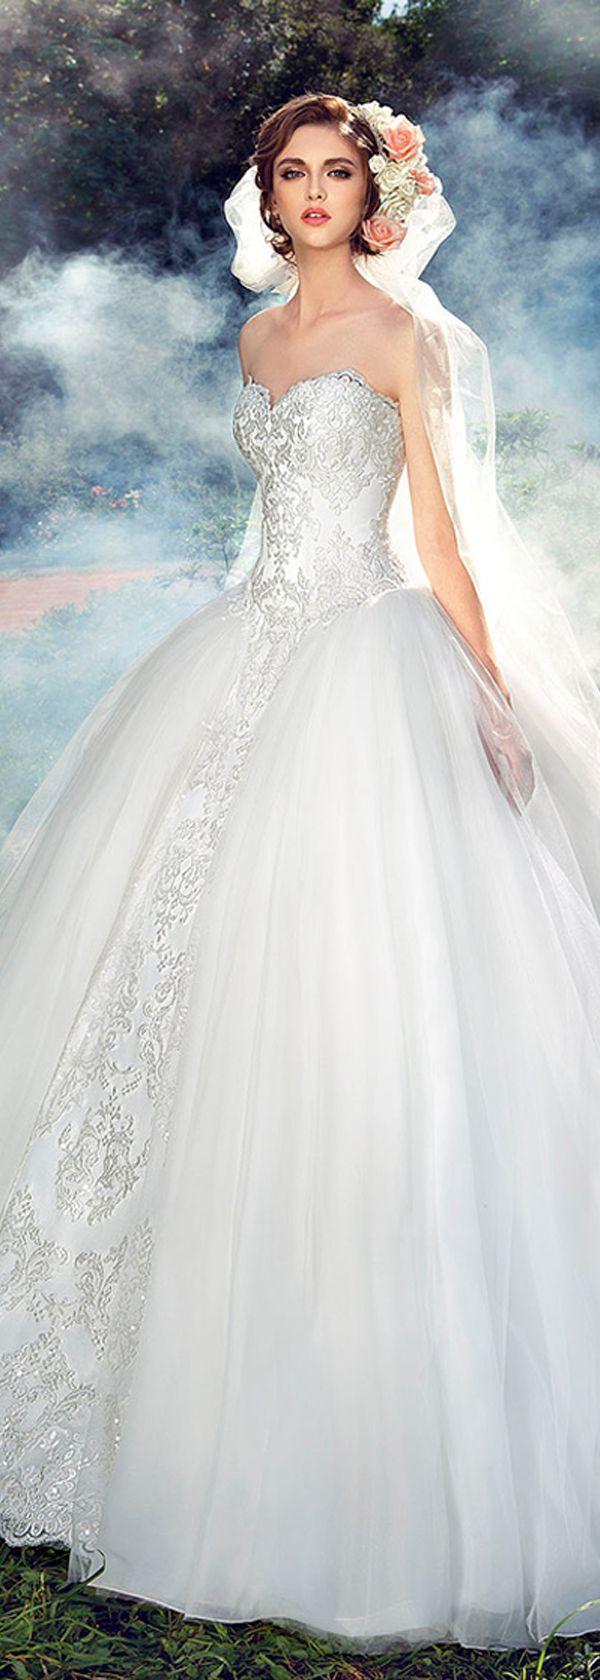 1032 best Brautkleider images on Pinterest | Homecoming dresses ...